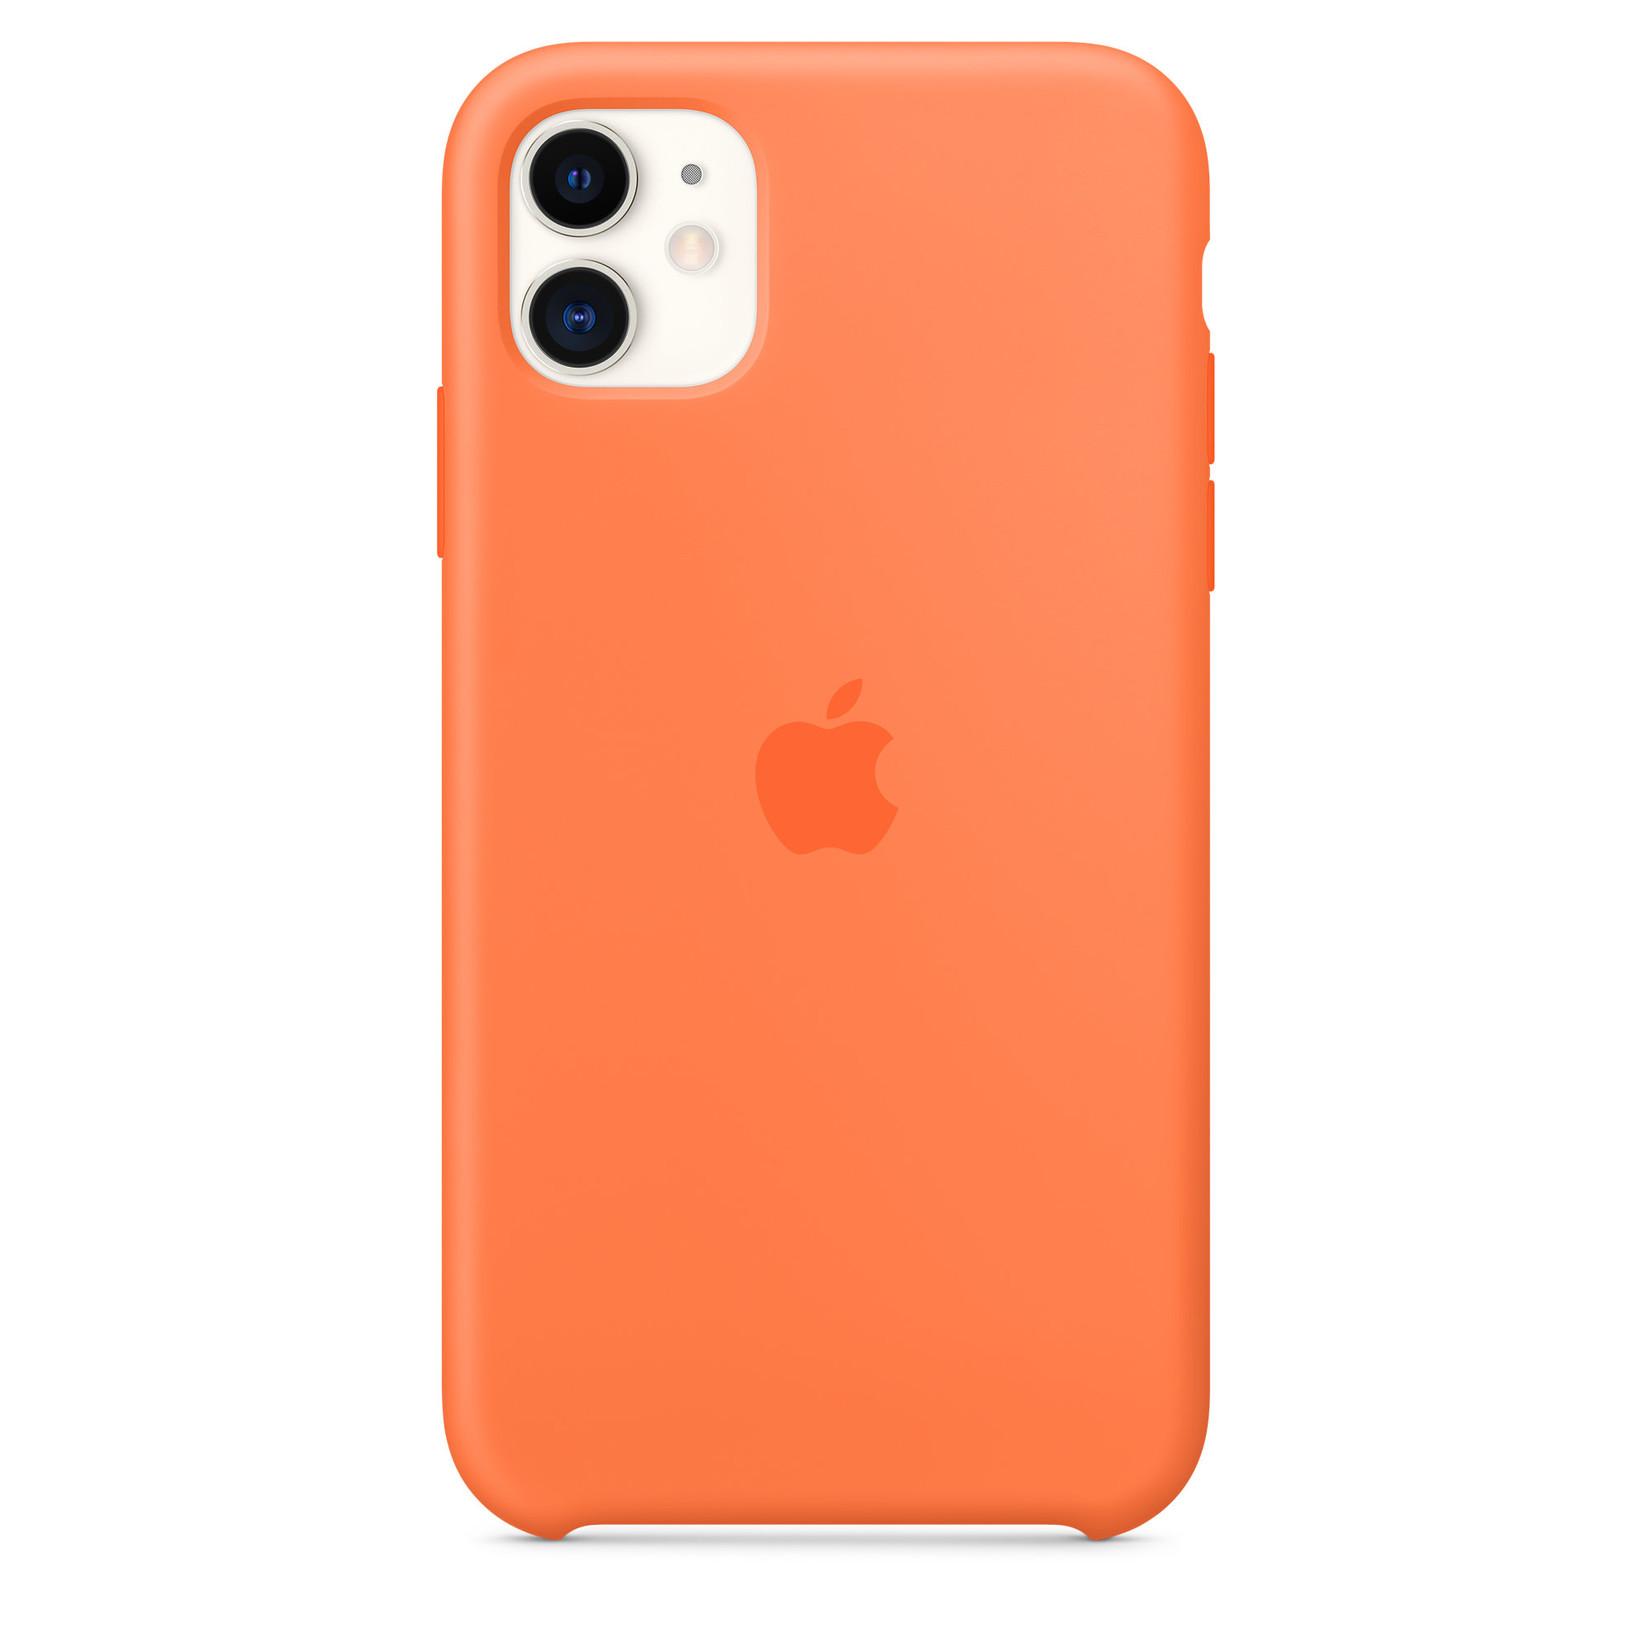 Apple Silicone Case (for iPhone 11) - Orange